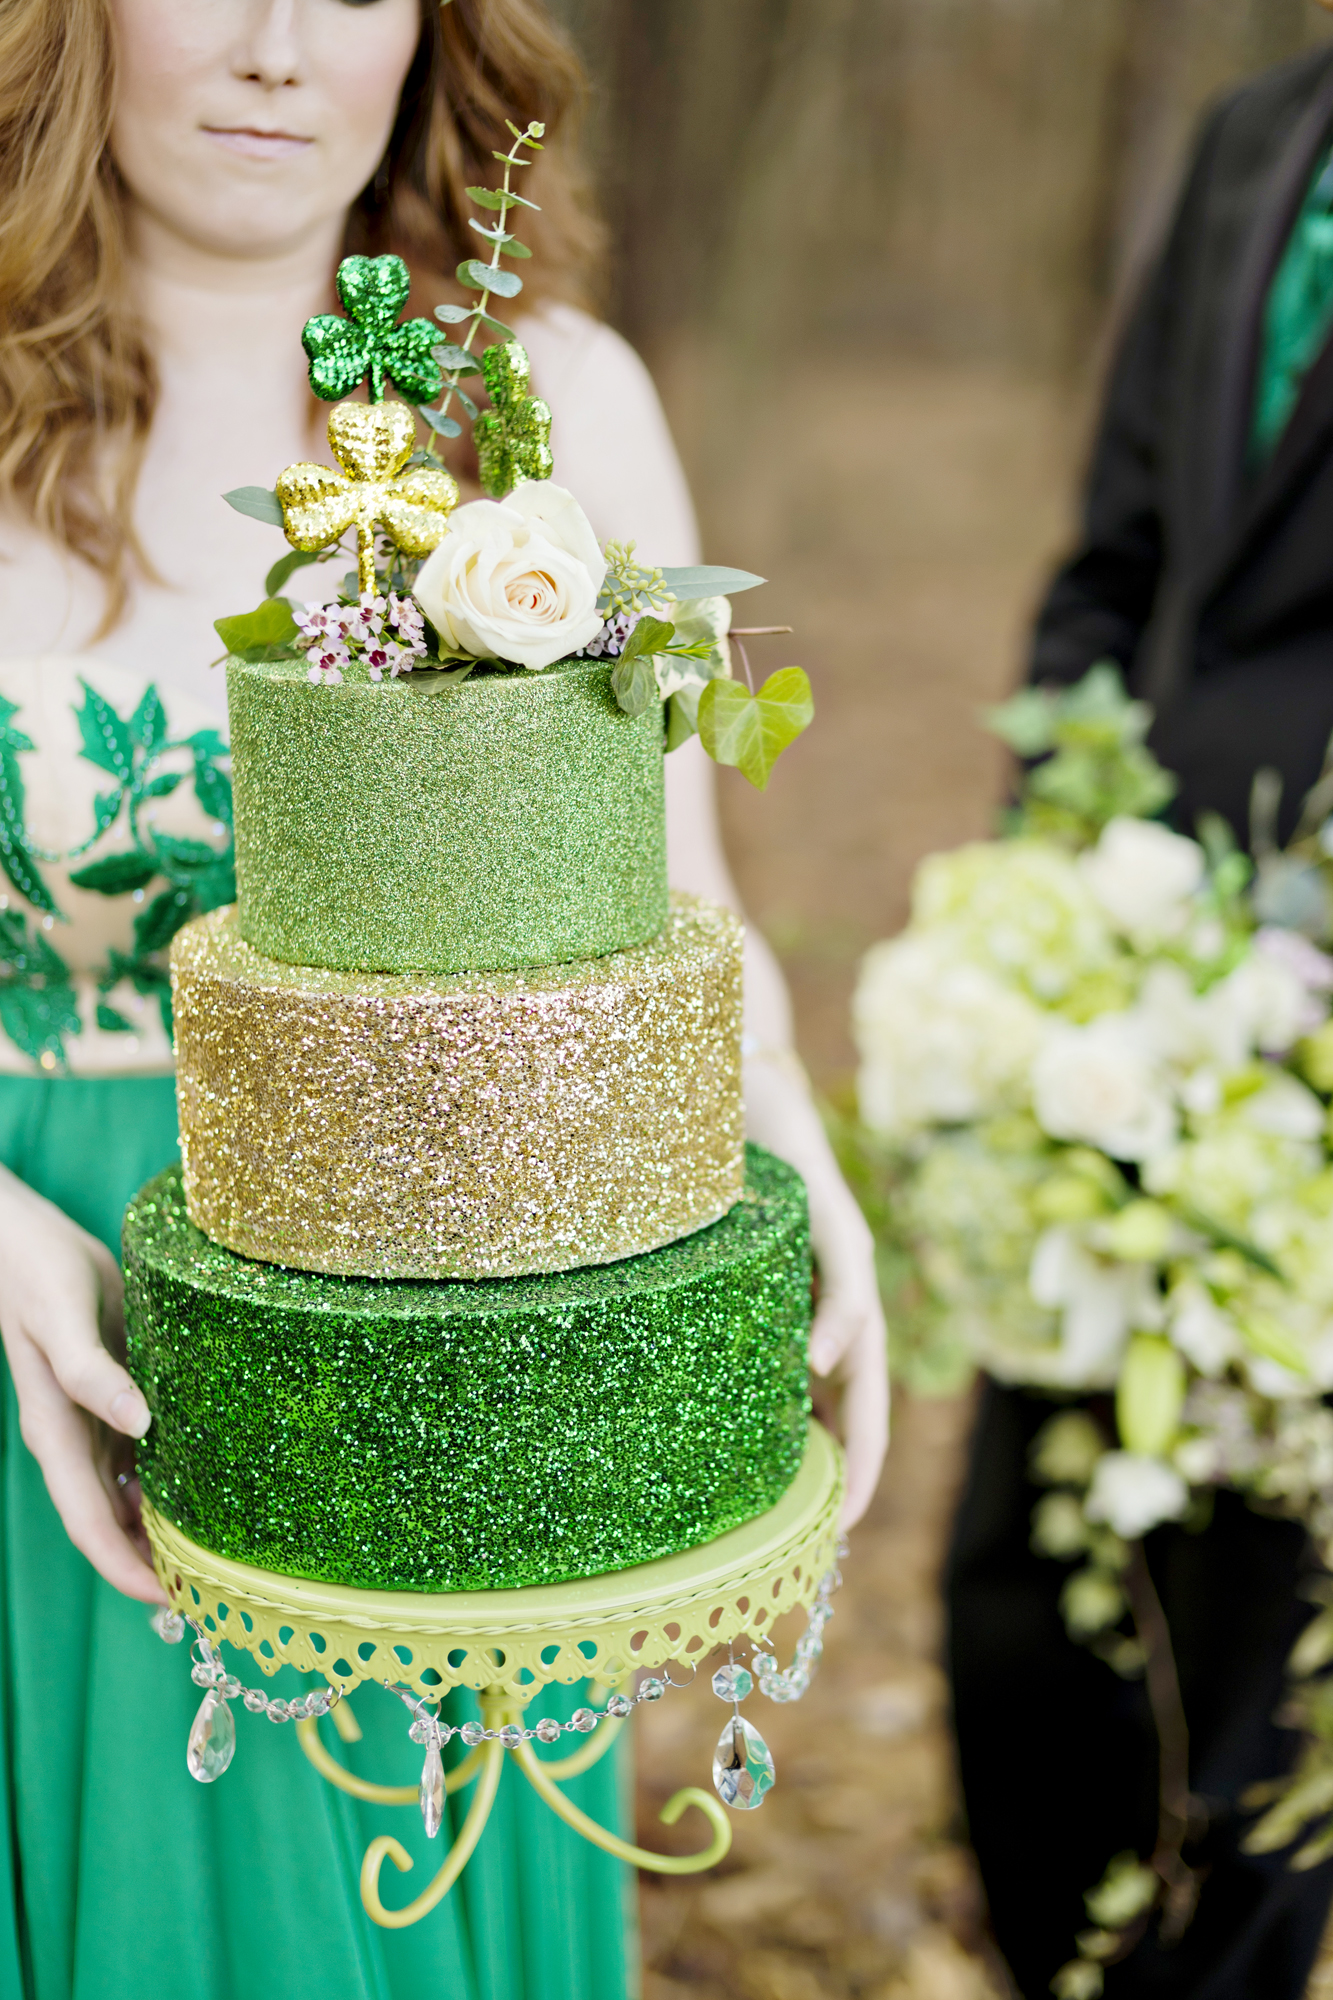 Opulent Treasures Cake Stands Andie Freeman Photo St Patricks Day Wedding03.jpg